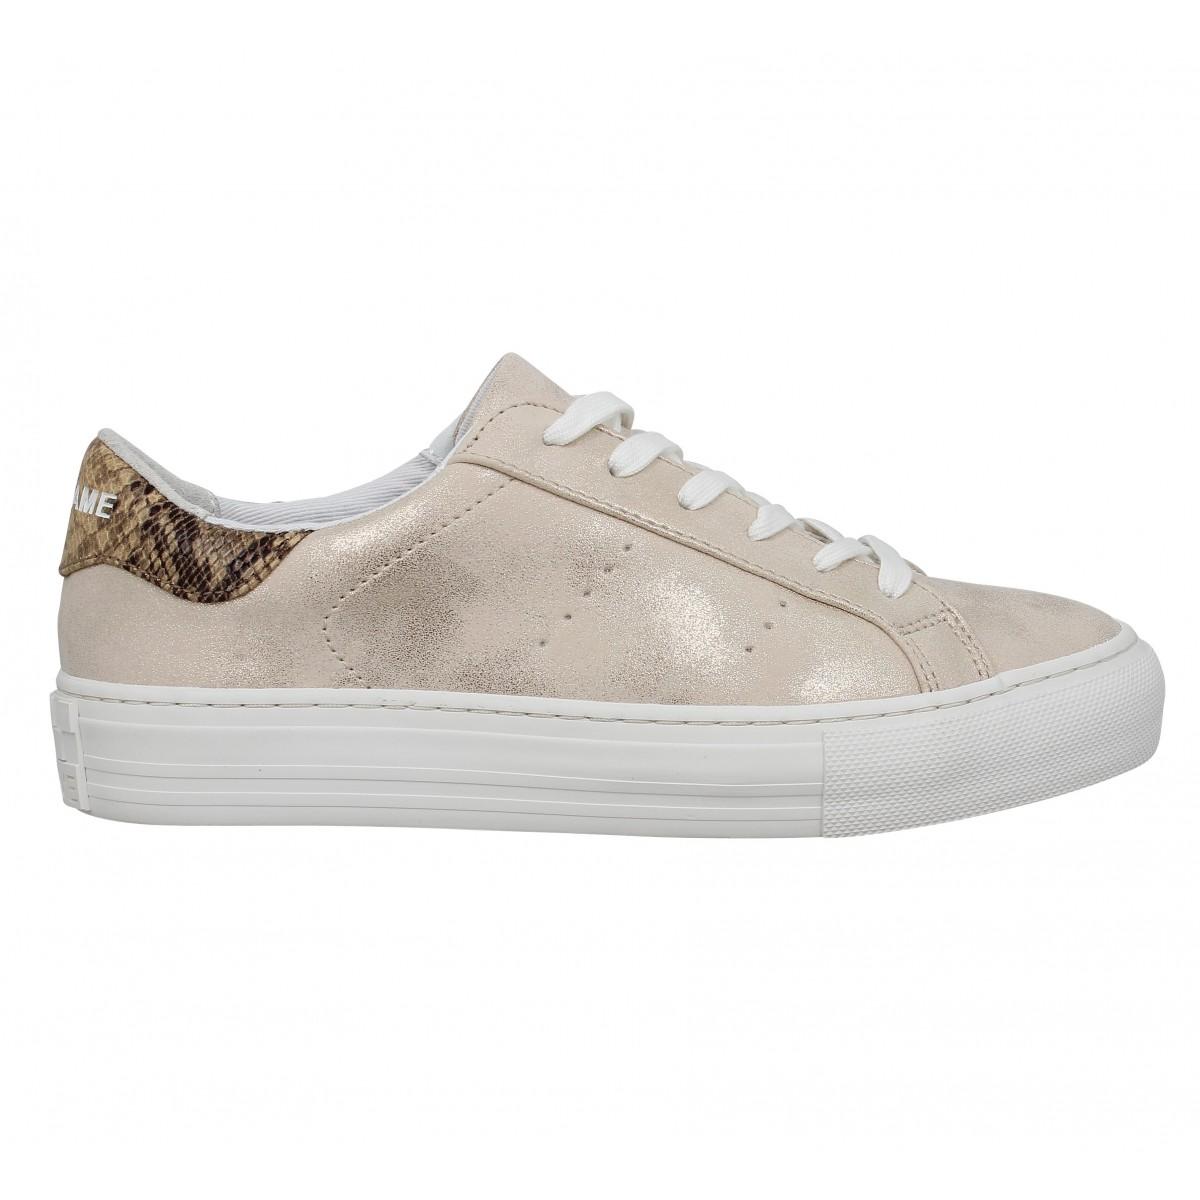 Sneaker Name WhiteFanny Arcade Glow Chaussures Femme No QeCBrWdxo